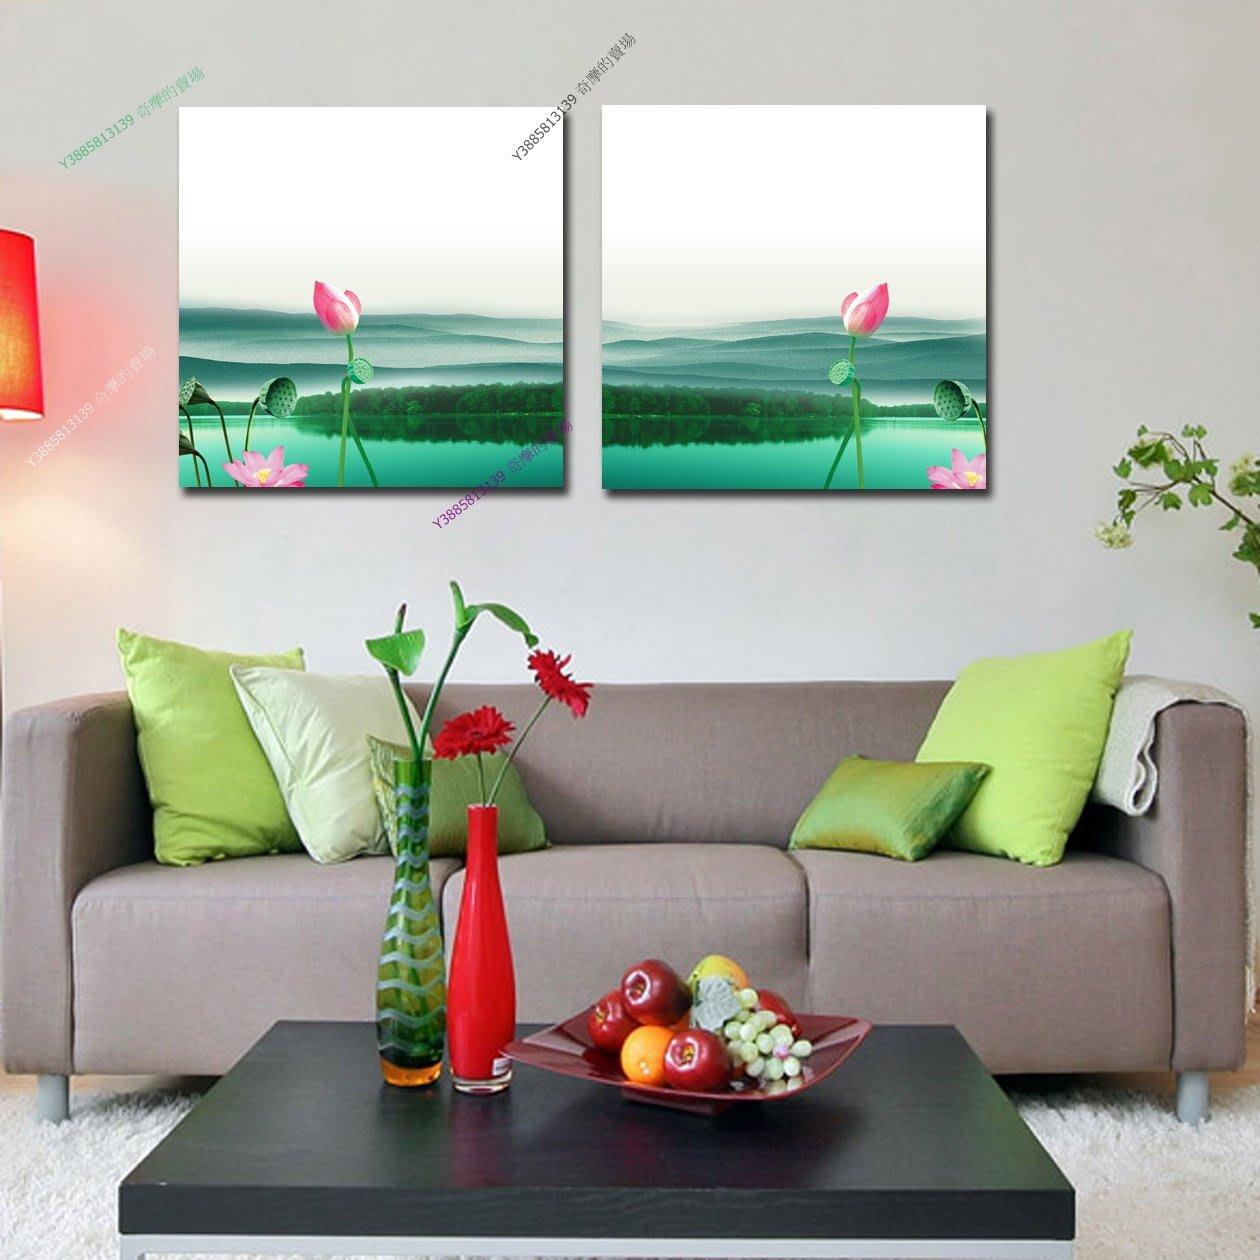 【60*60cm】【厚2.5cm】夏日荷塘-無框畫裝飾畫版畫客廳簡約家居餐廳臥室牆壁【280101_358】(1套價格)